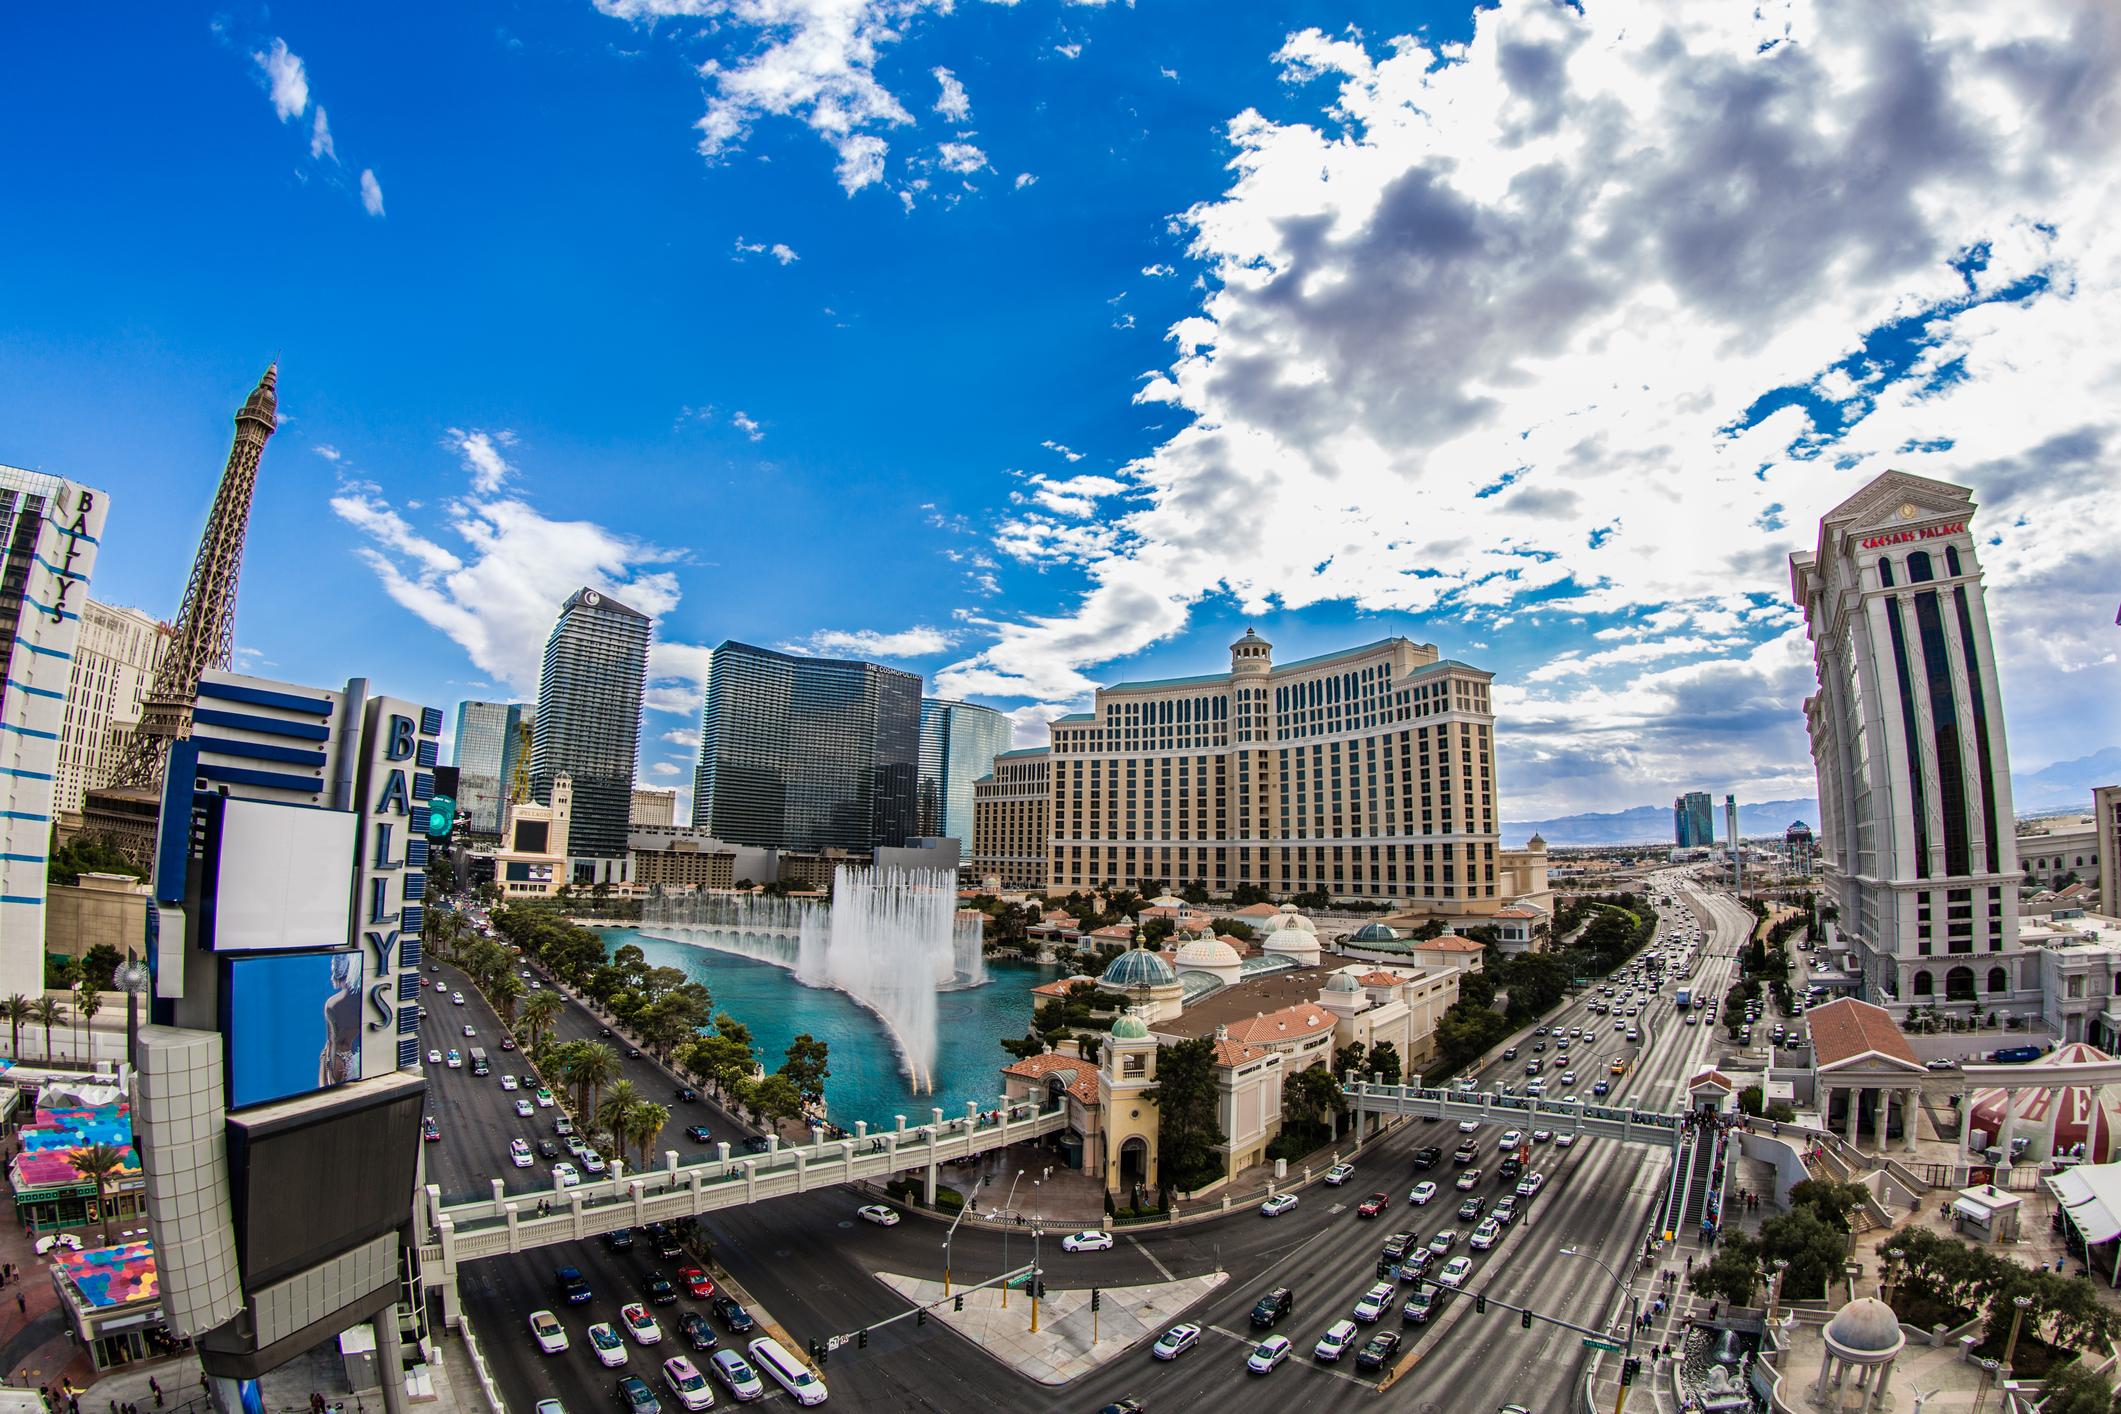 View of the Las Vegas Strip.